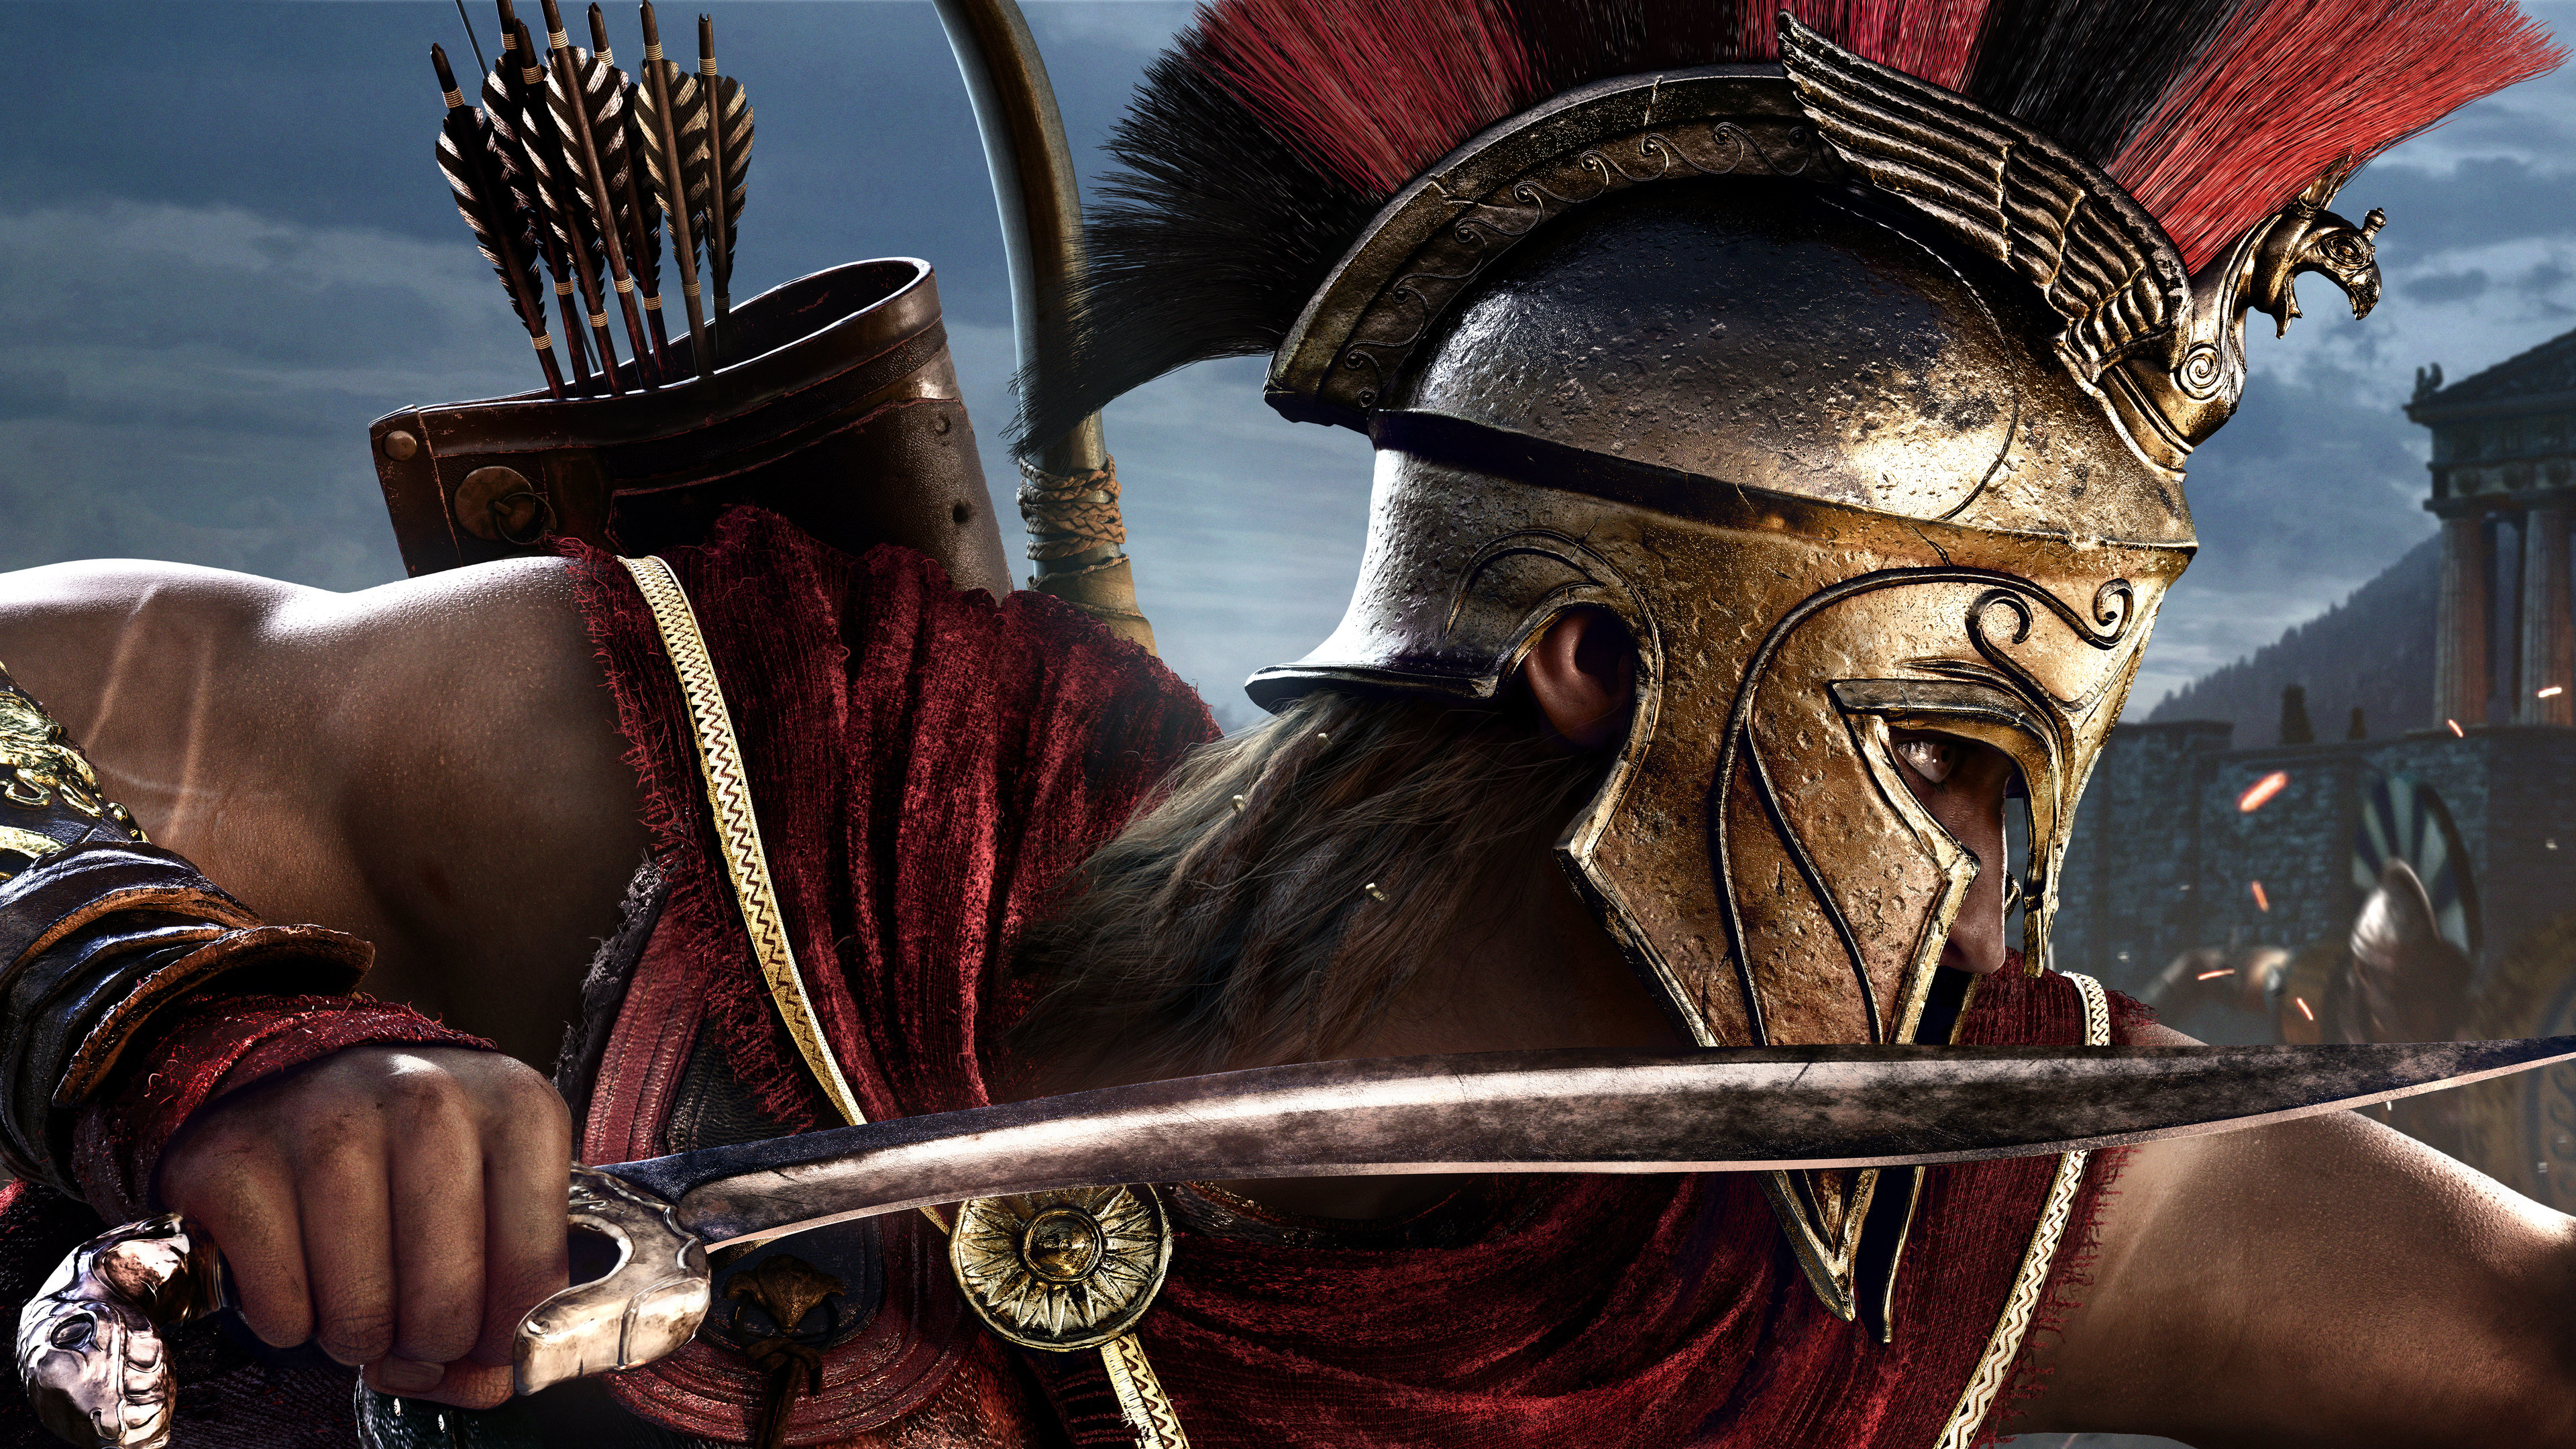 2018 assassins creed odyssey 8k 1537690293 - 2018 Assassins Creed Odyssey 8k - hd-wallpapers, games wallpapers, assassins creed wallpapers, assassins creed odyssey wallpapers, 8k wallpapers, 5k wallpapers, 4k-wallpapers, 2018 games wallpapers